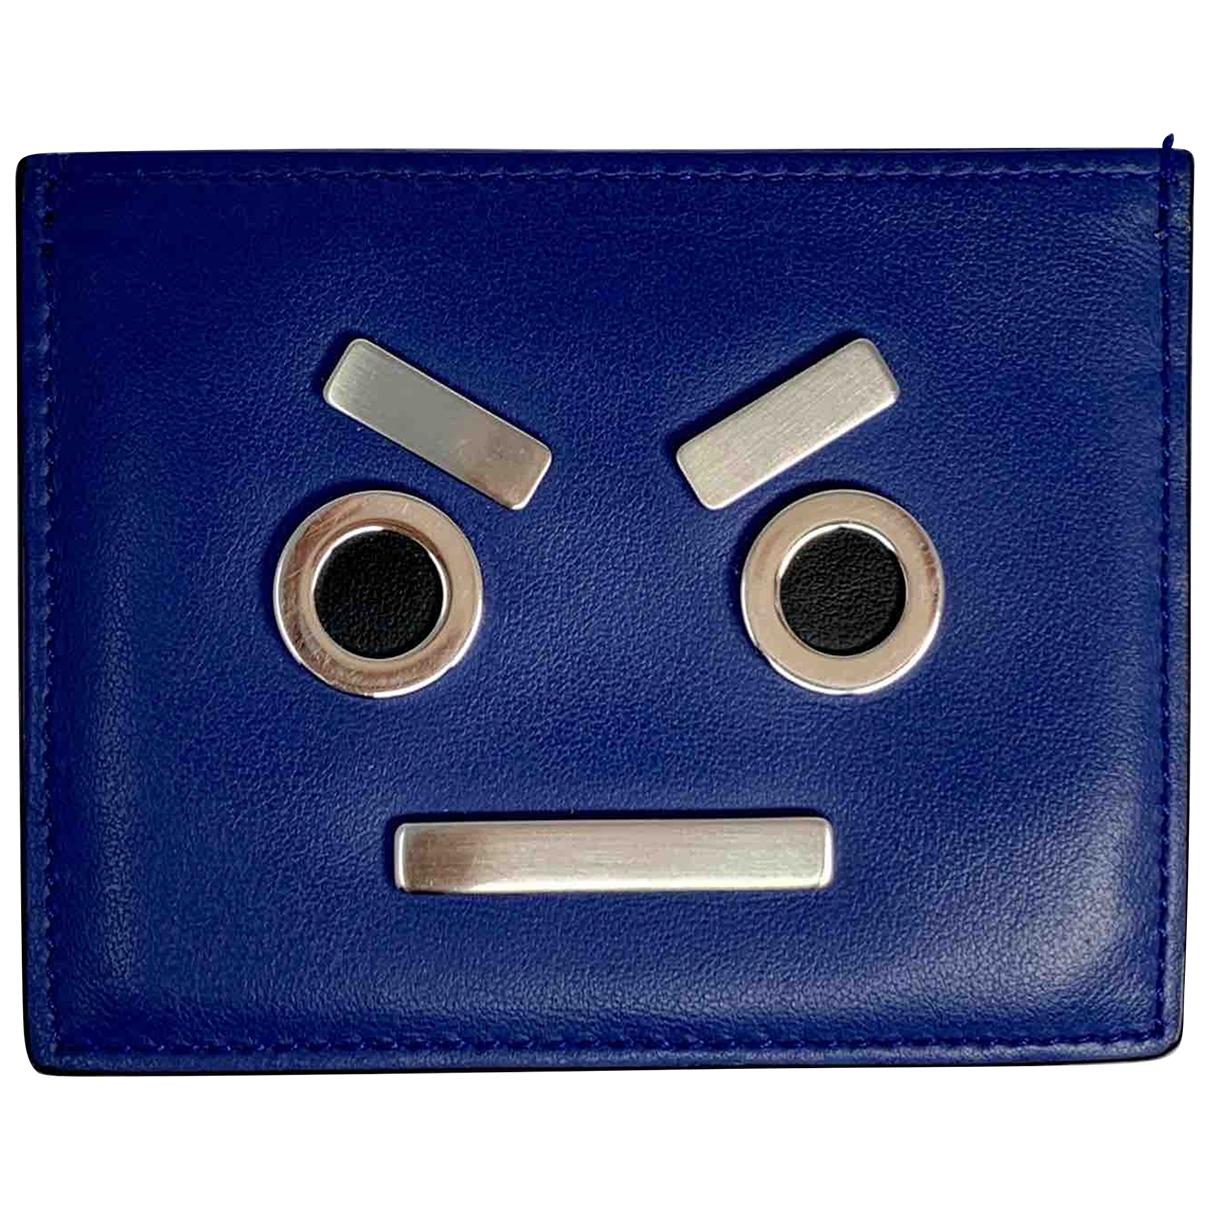 Fendi \N Kleinlederwaren in  Blau Leder